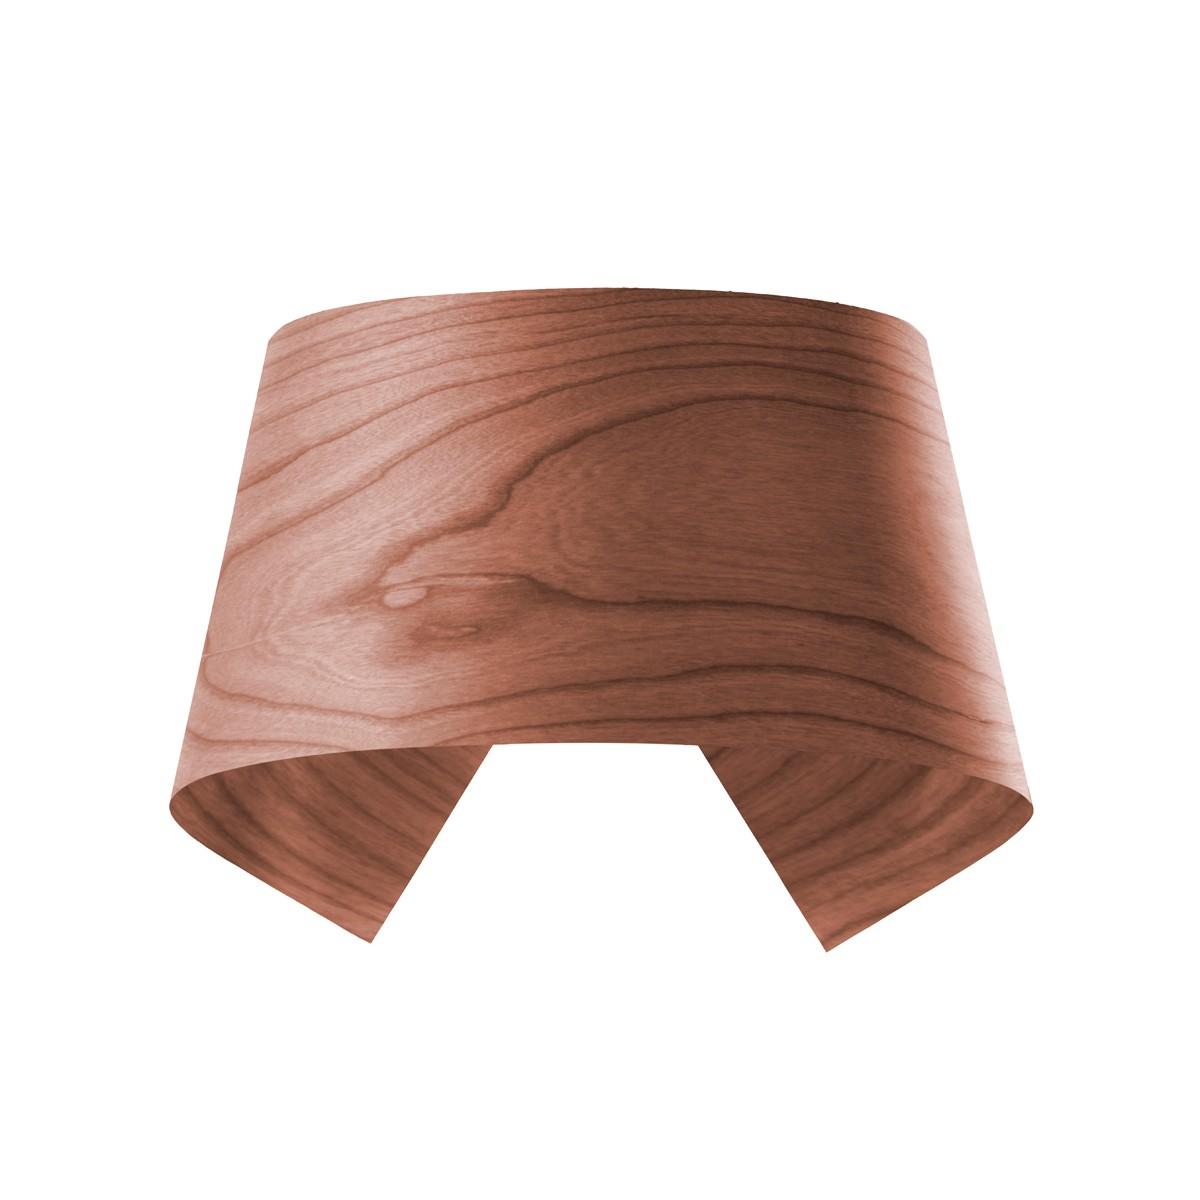 LZF Lamps Hi-Collar Wandleuchte, schokolade